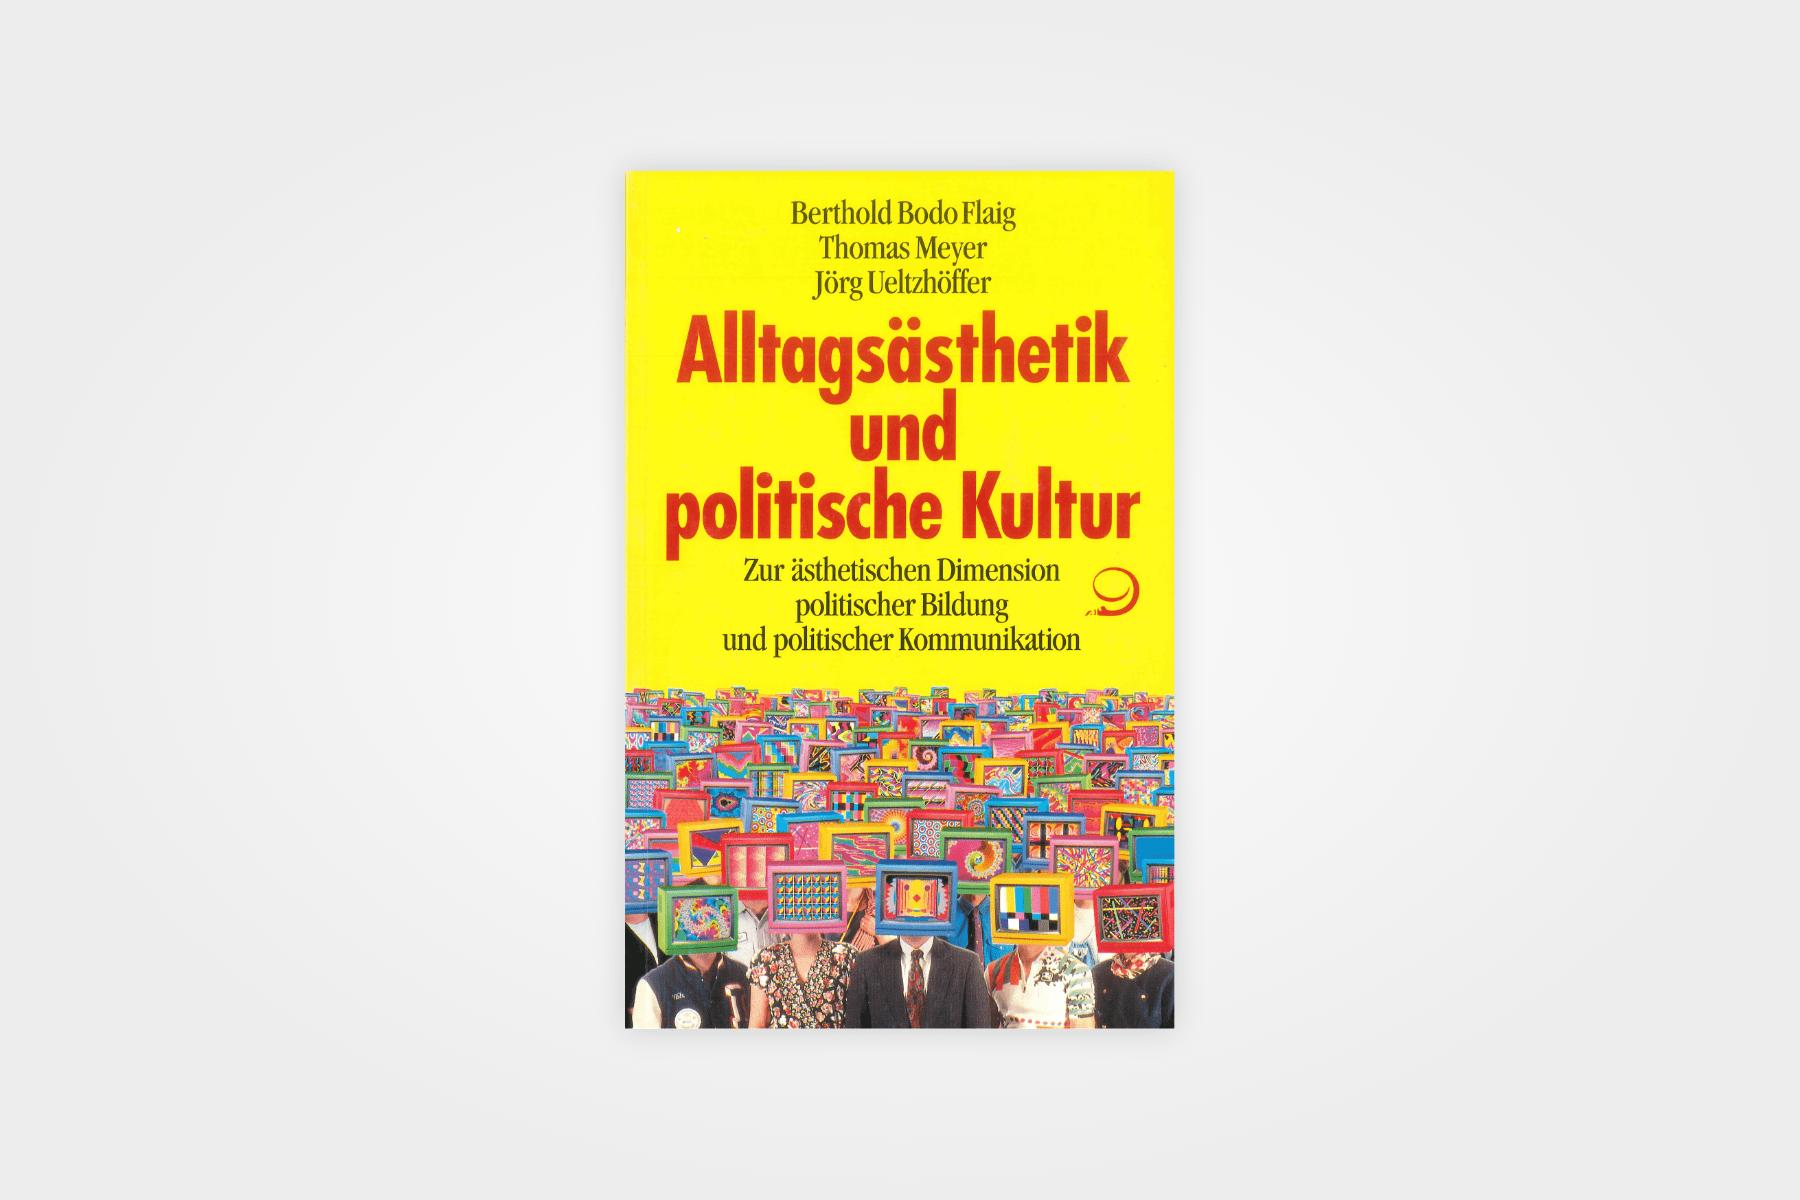 Alltagsästhetik und politische Kultur